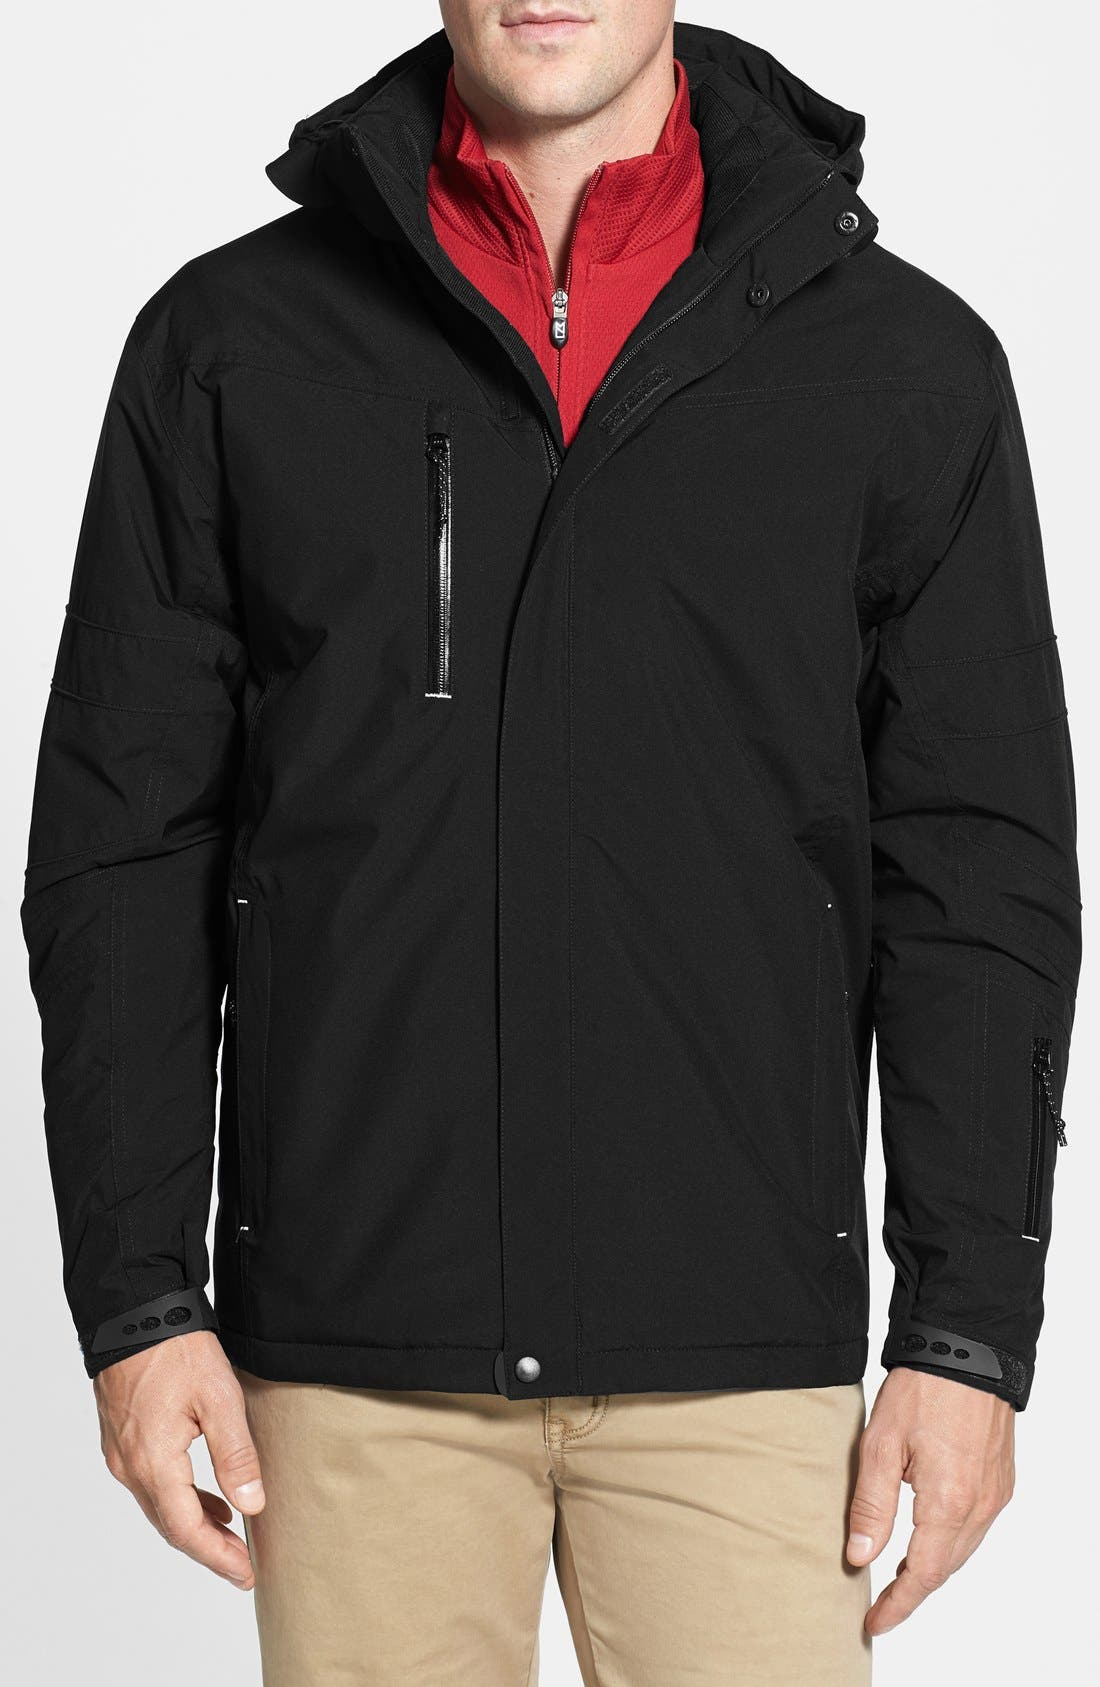 Cutter & Buck WeatherTec Sanders Jacket (Big & Tall)